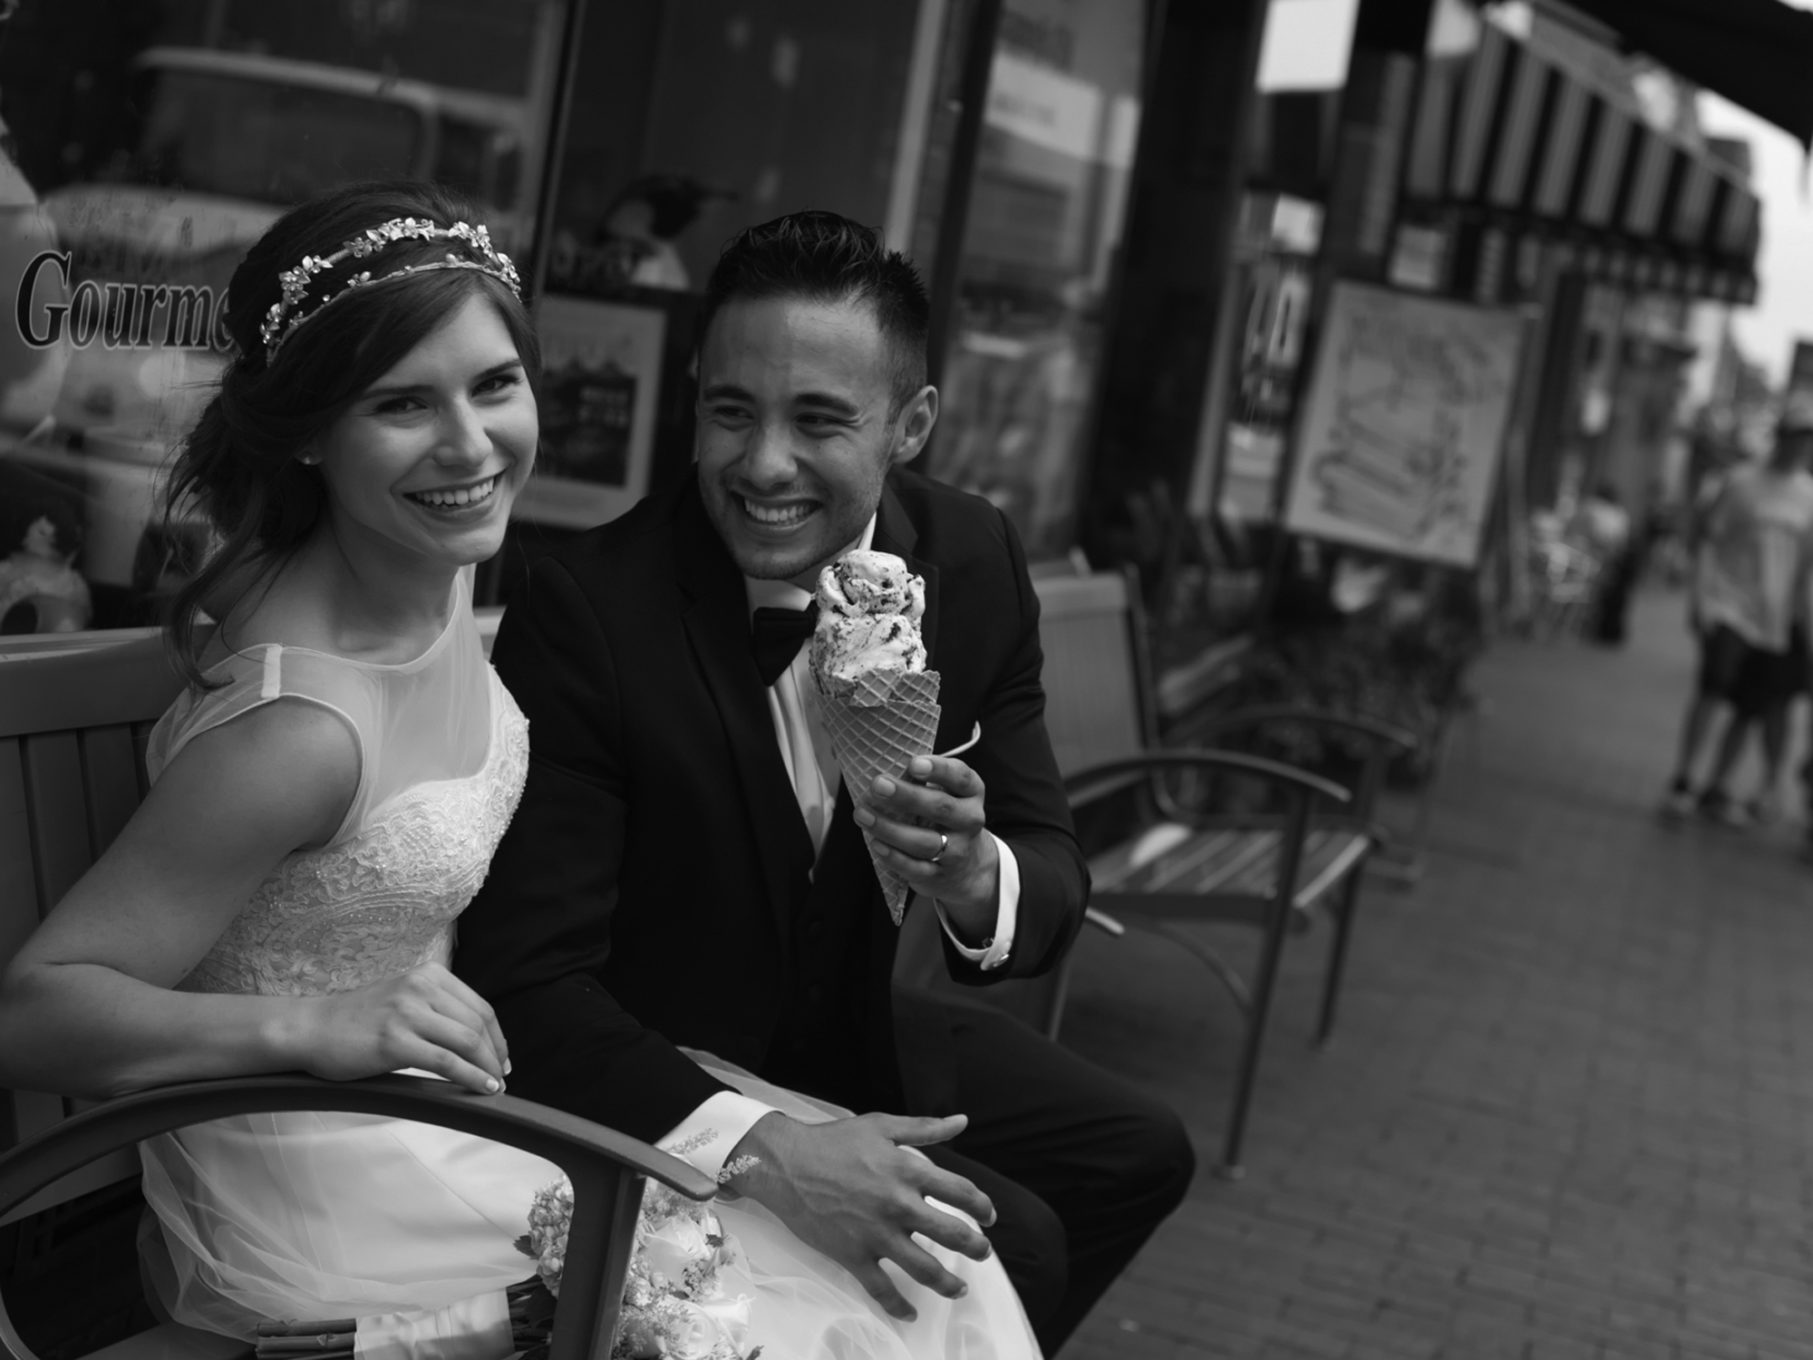 elope-photography-go-have-icecream-jax-photography